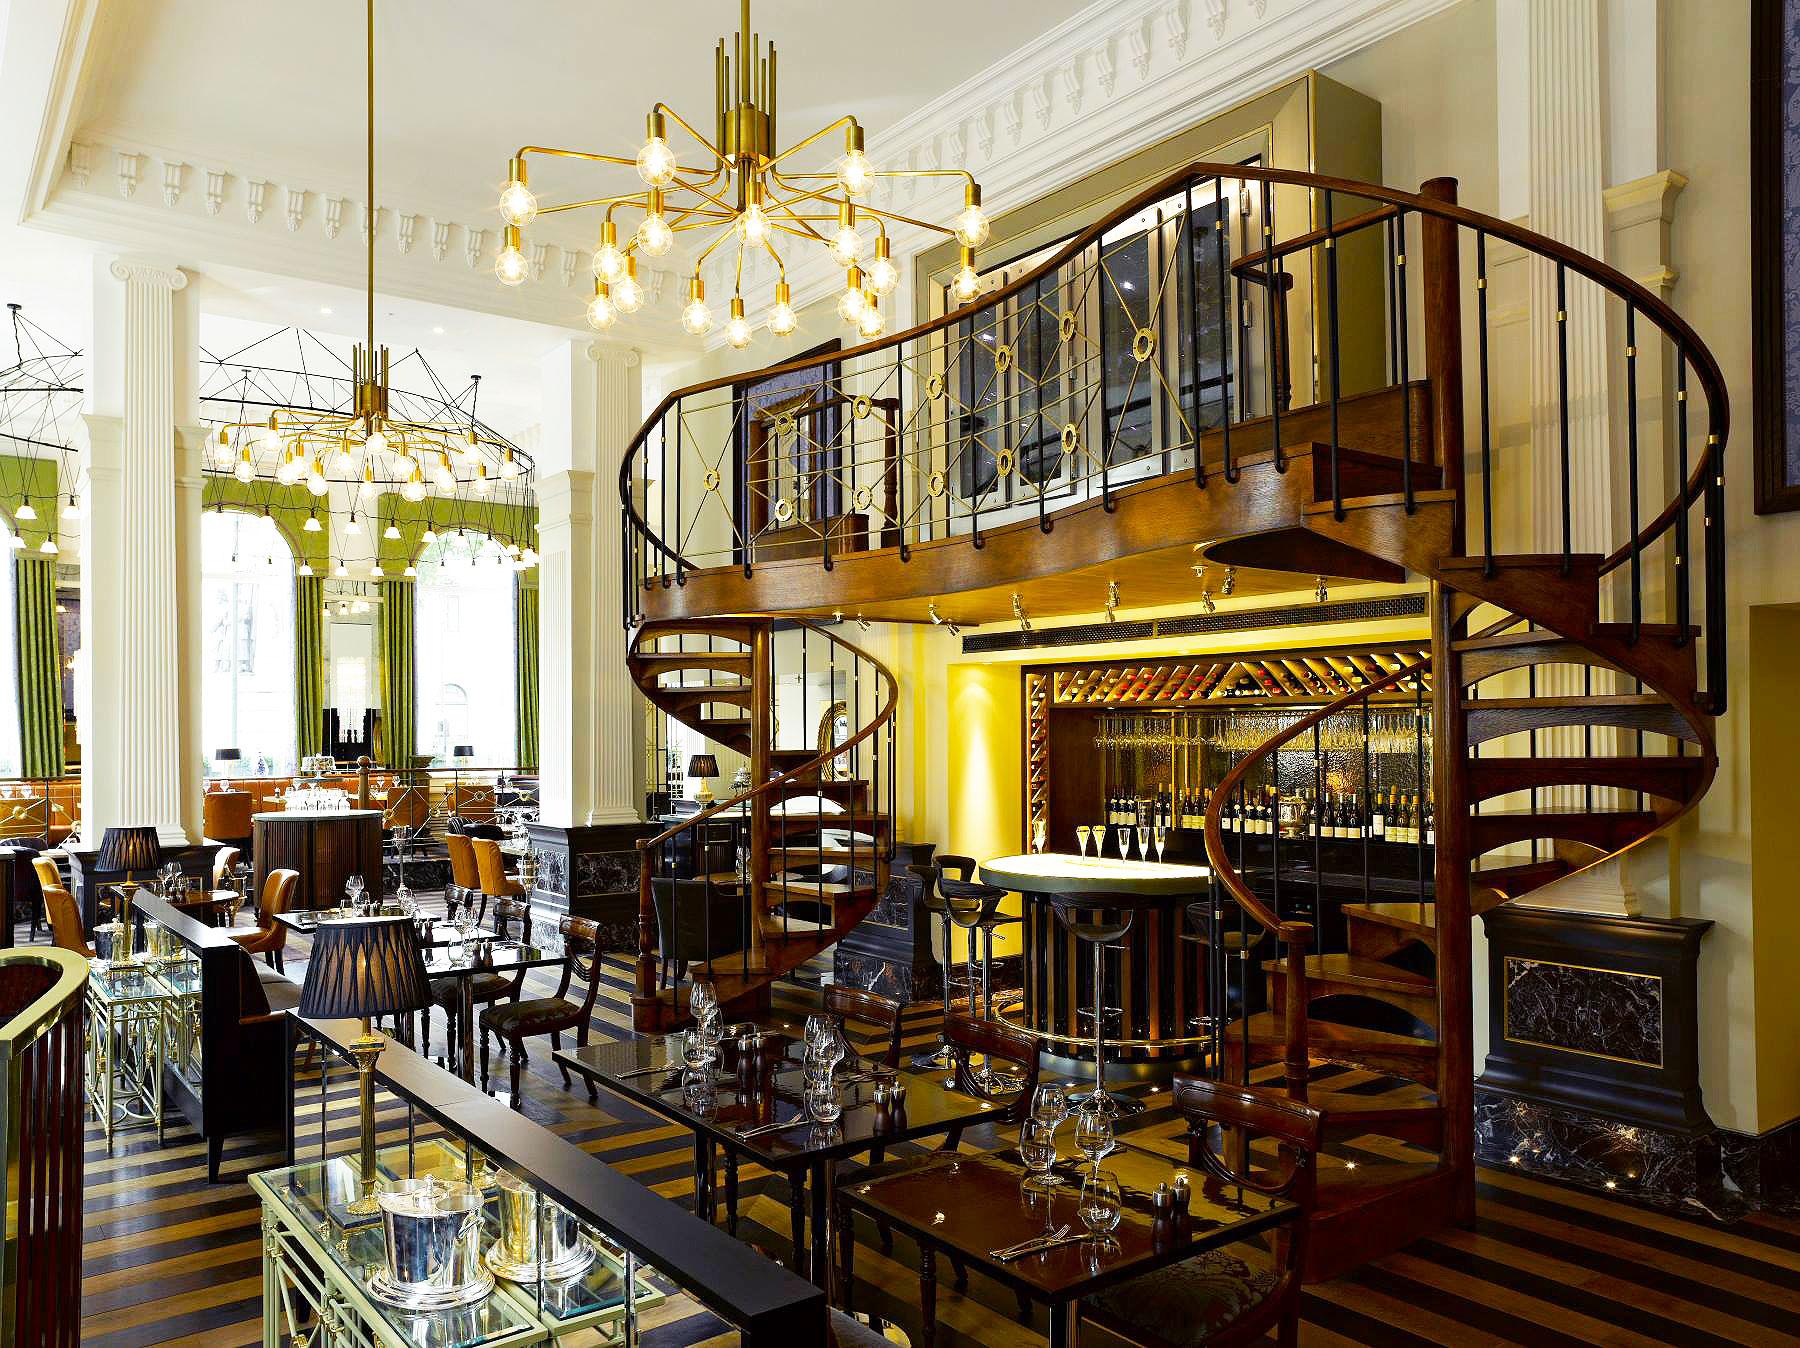 Holborn Dining Room, Rosewood Hotel, London - Restaurant